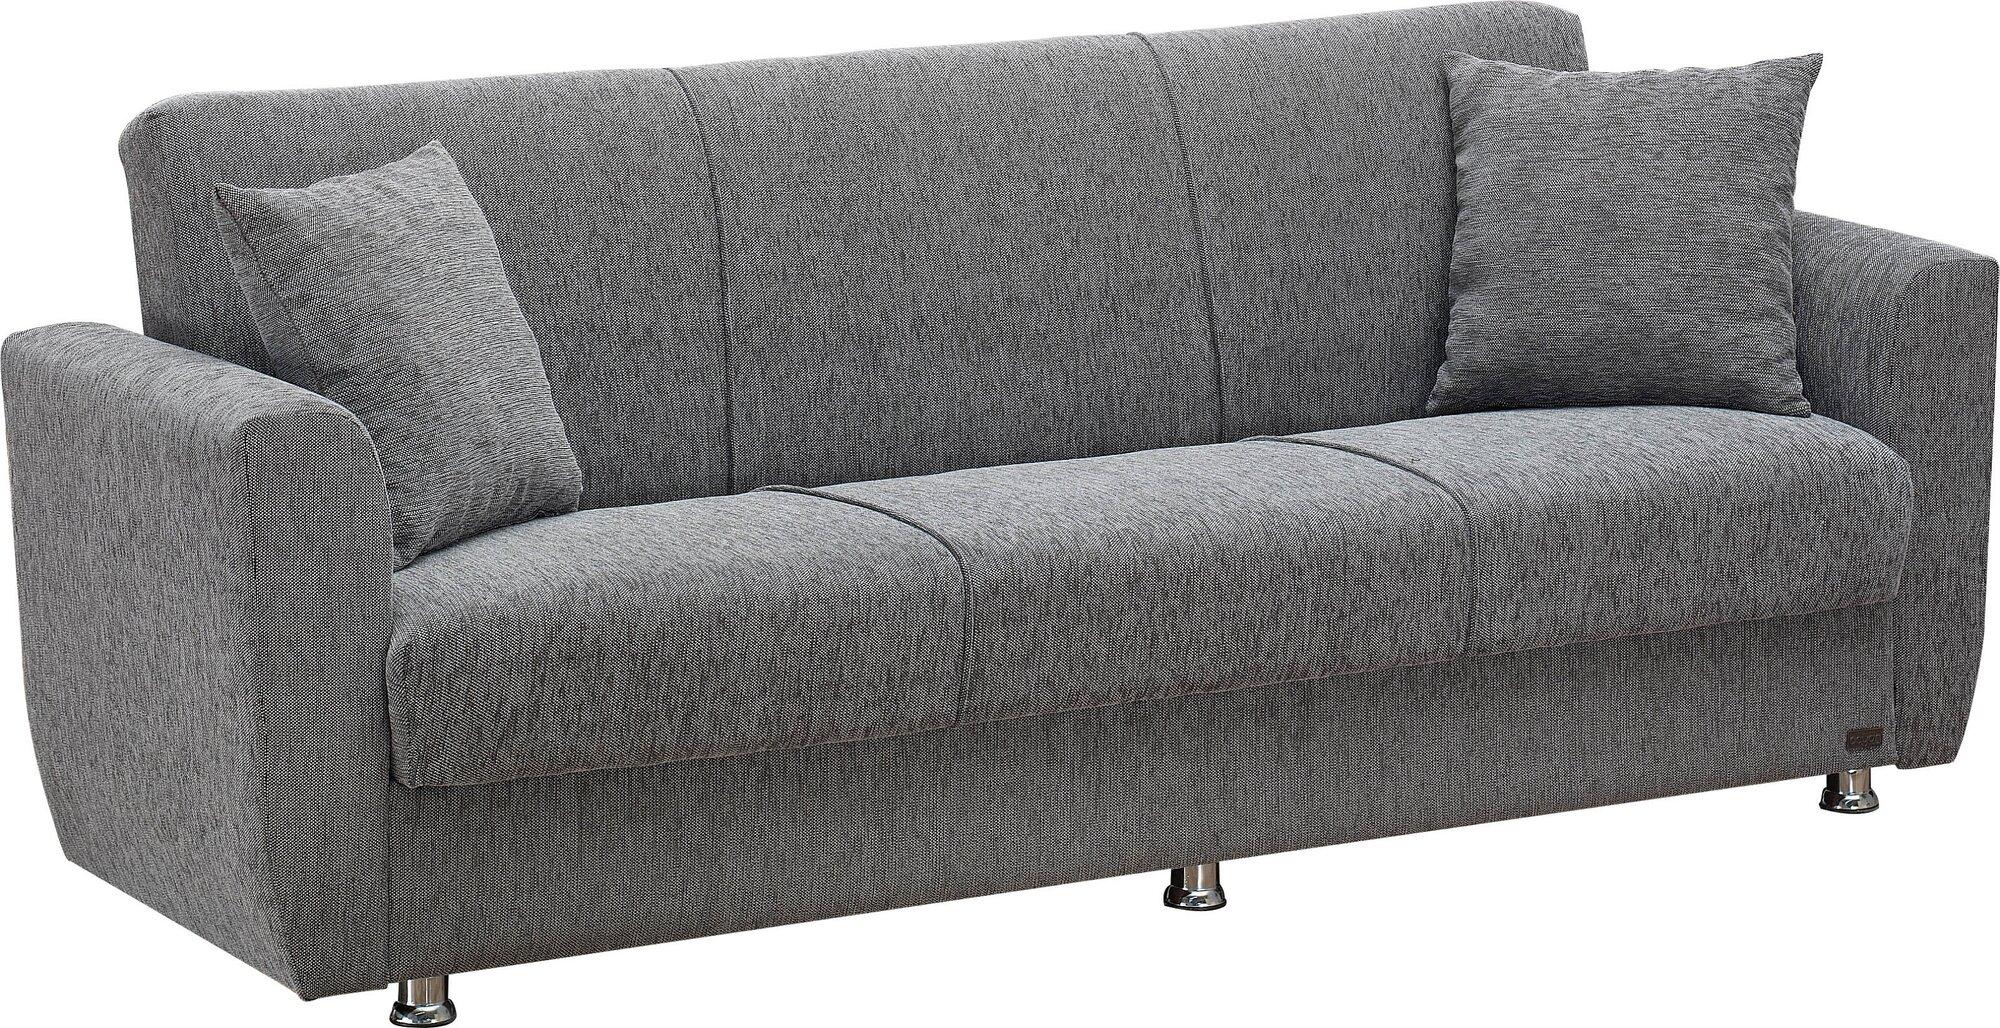 Sofas No Credit Check Furniture Progressive Finance Loans With Thesofa